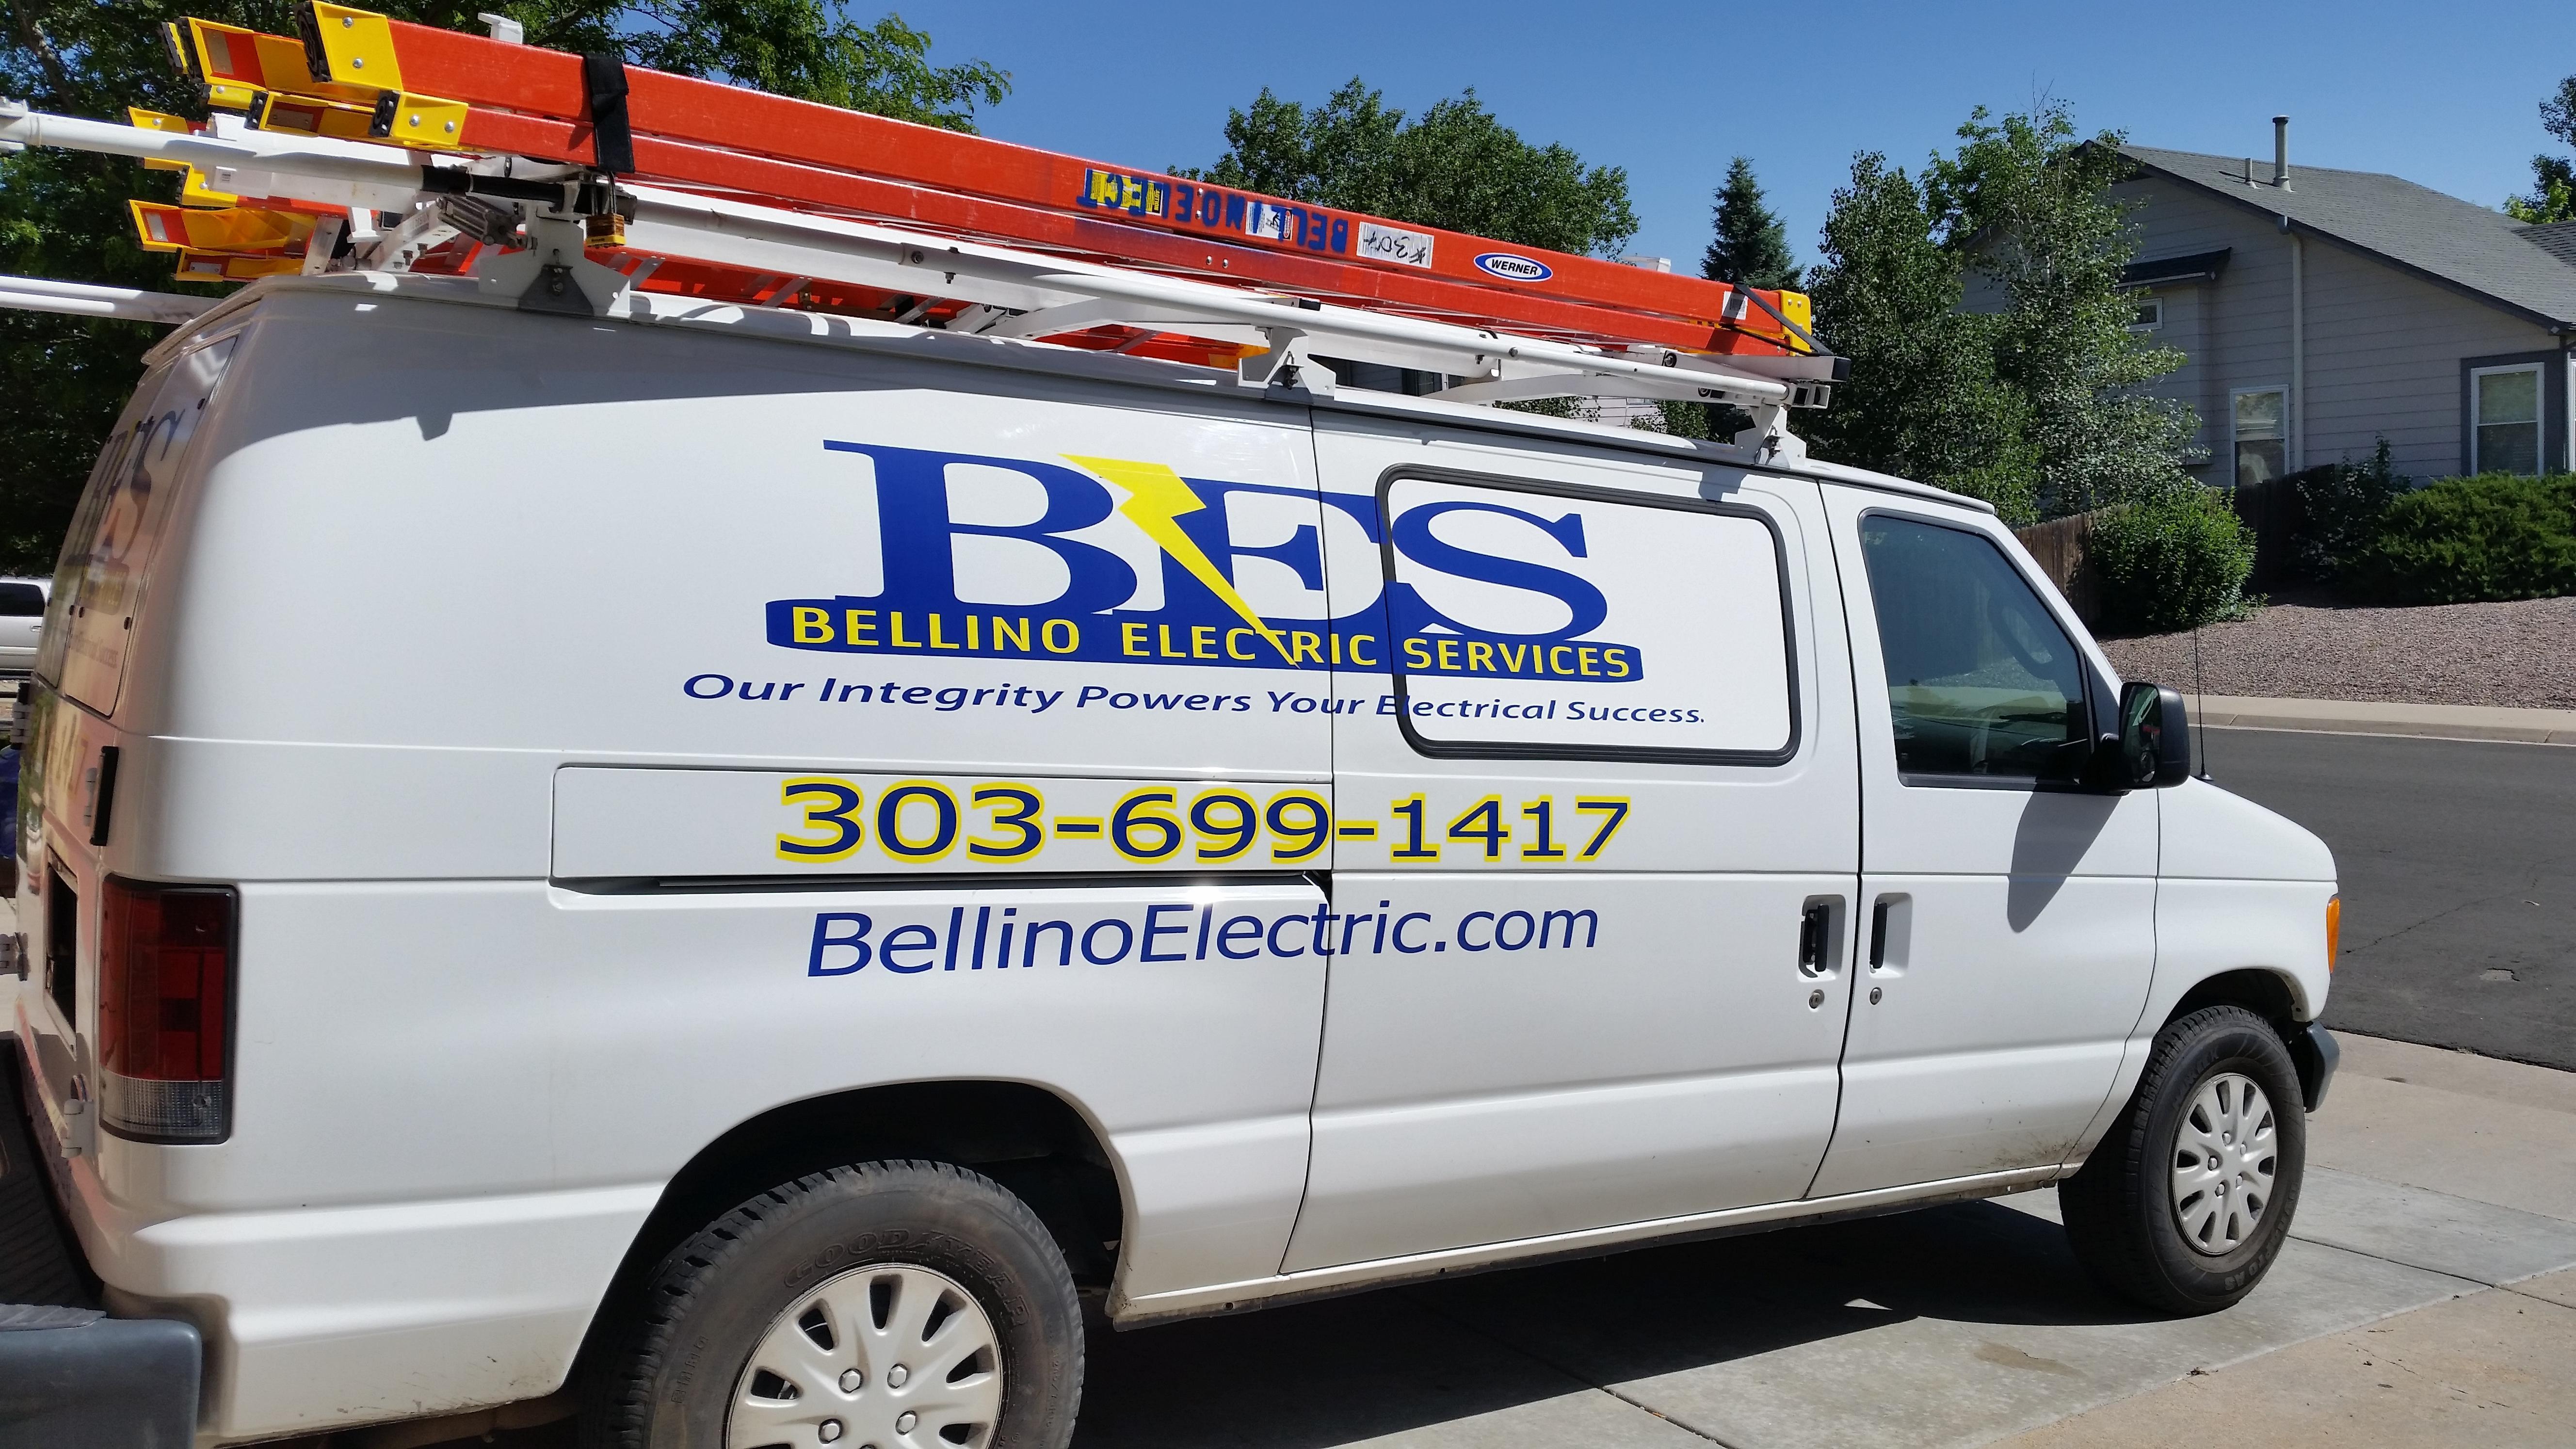 Bellino Electric Services